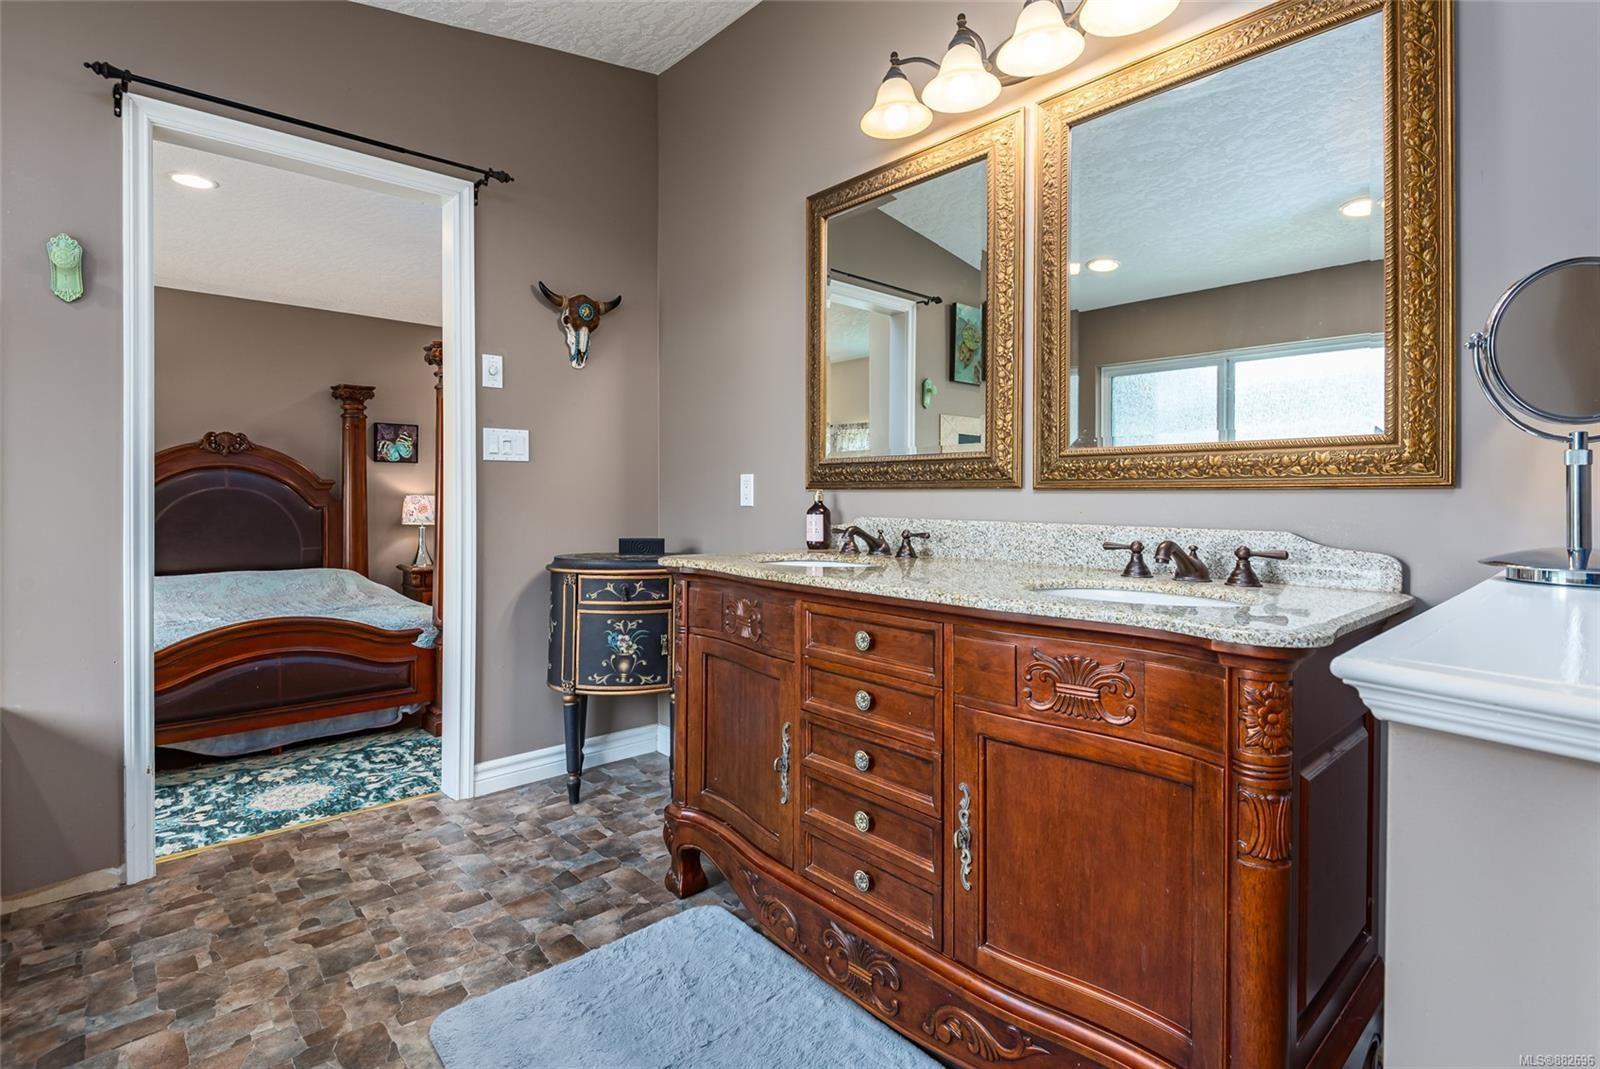 Photo 20: Photos: 3554 MacAulay Rd in : CV Merville Black Creek House for sale (Comox Valley)  : MLS®# 882696